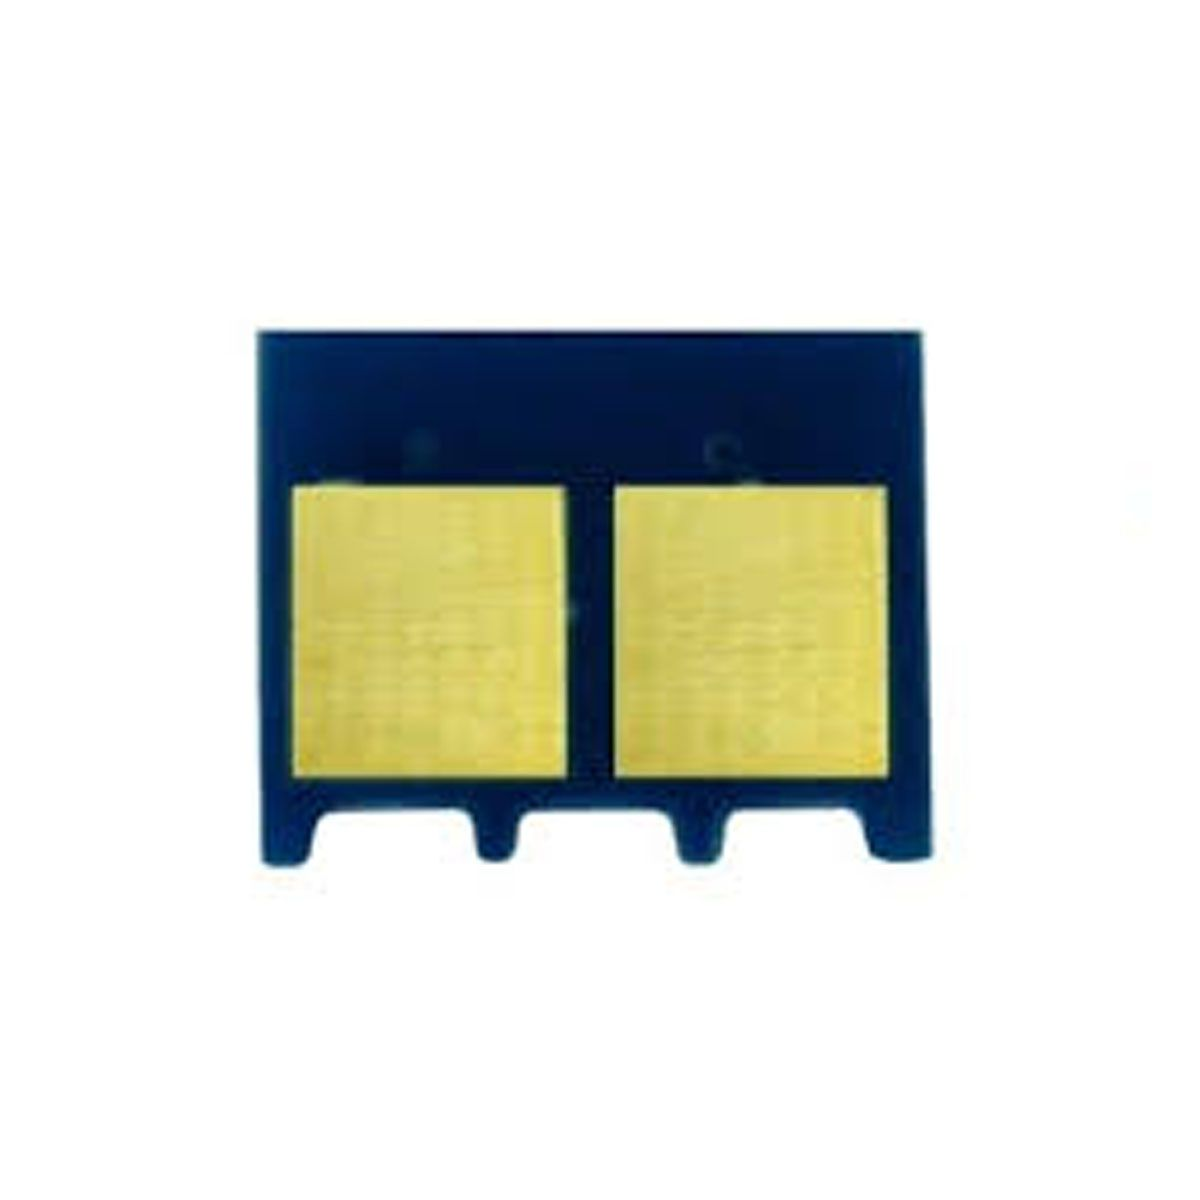 Chip HP CB541 CE411 CC531 CE311 CF211 CE321 CE401 CE381 CE251 - TRC/C1 Ciano - 1215 1515